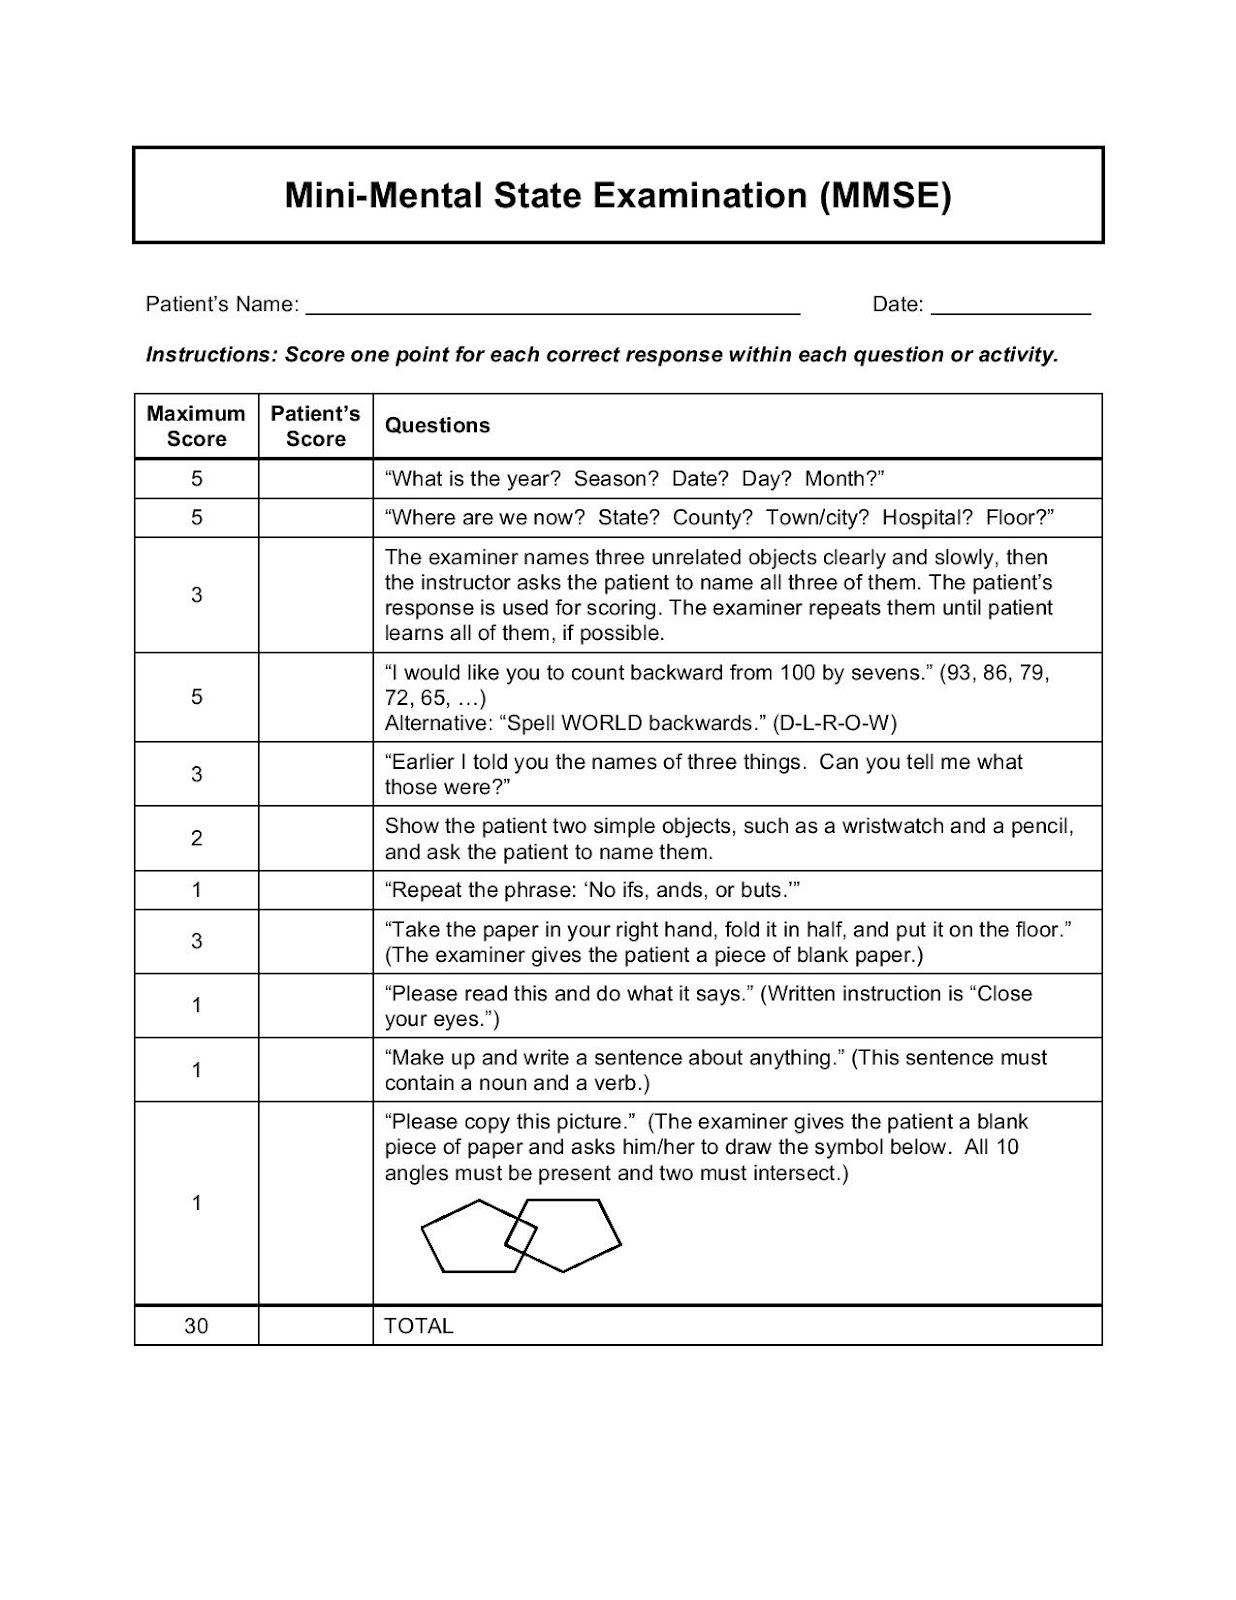 Mmse in Nursing